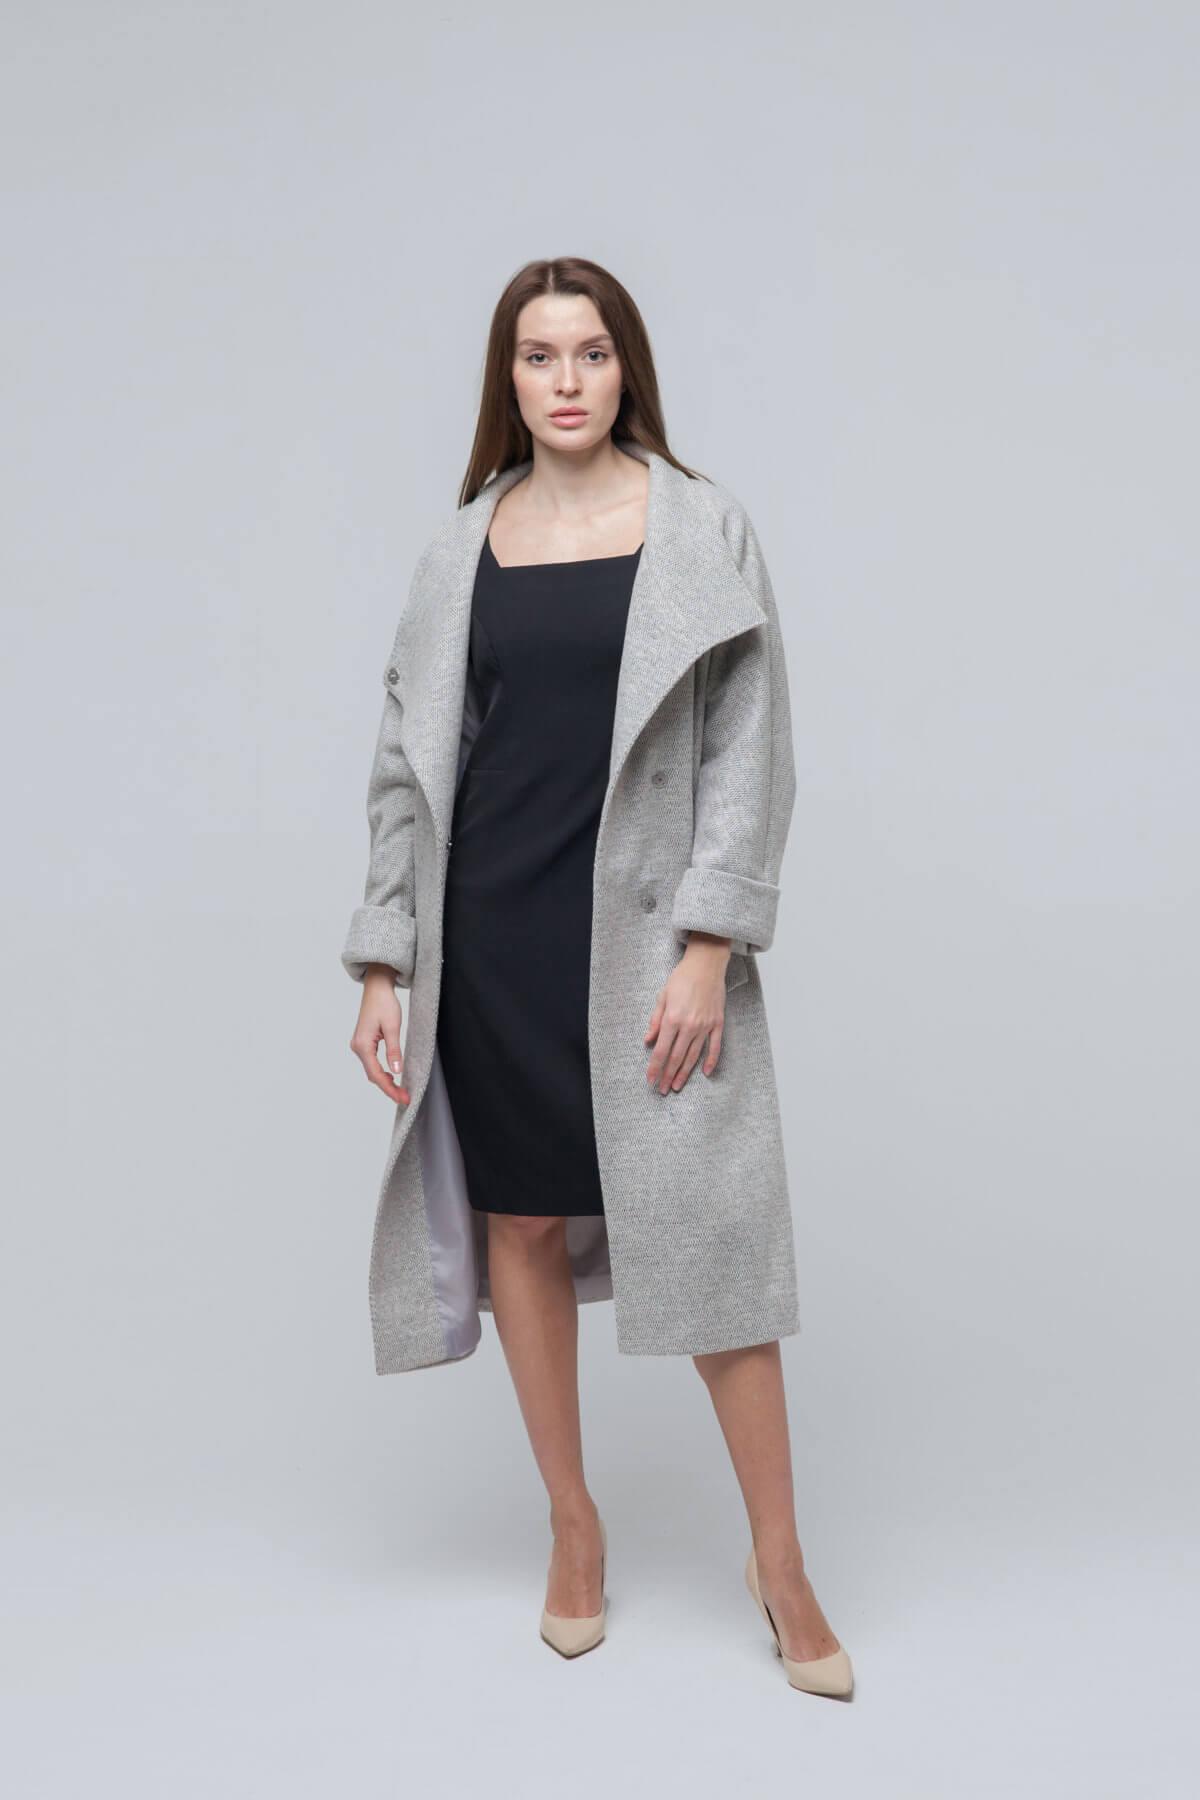 Пальто из текстиля. Фото 3